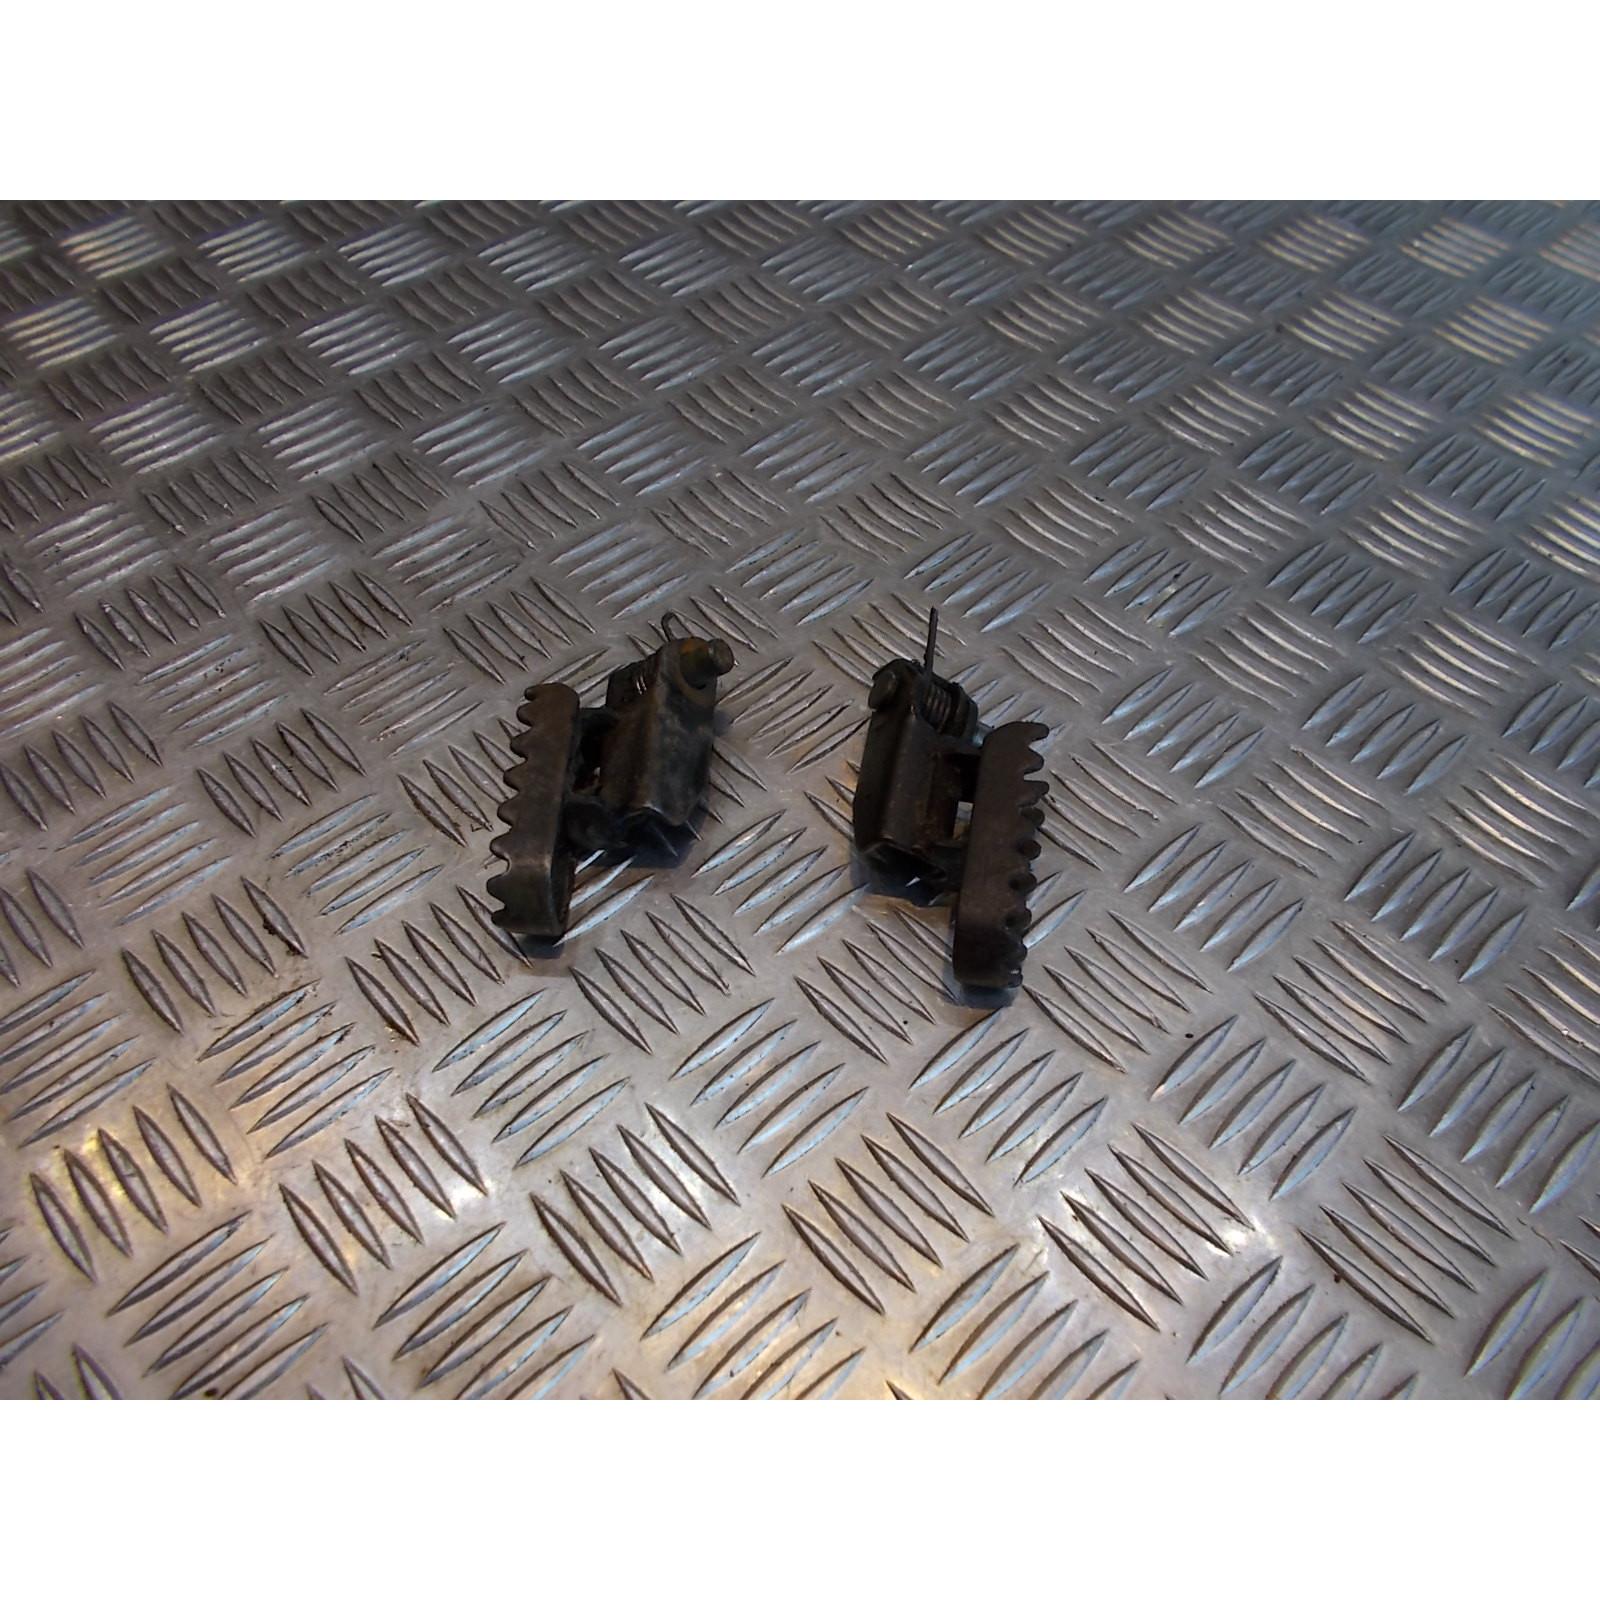 paire cale repose pied avant conducteur moto suzuki ts 125 er